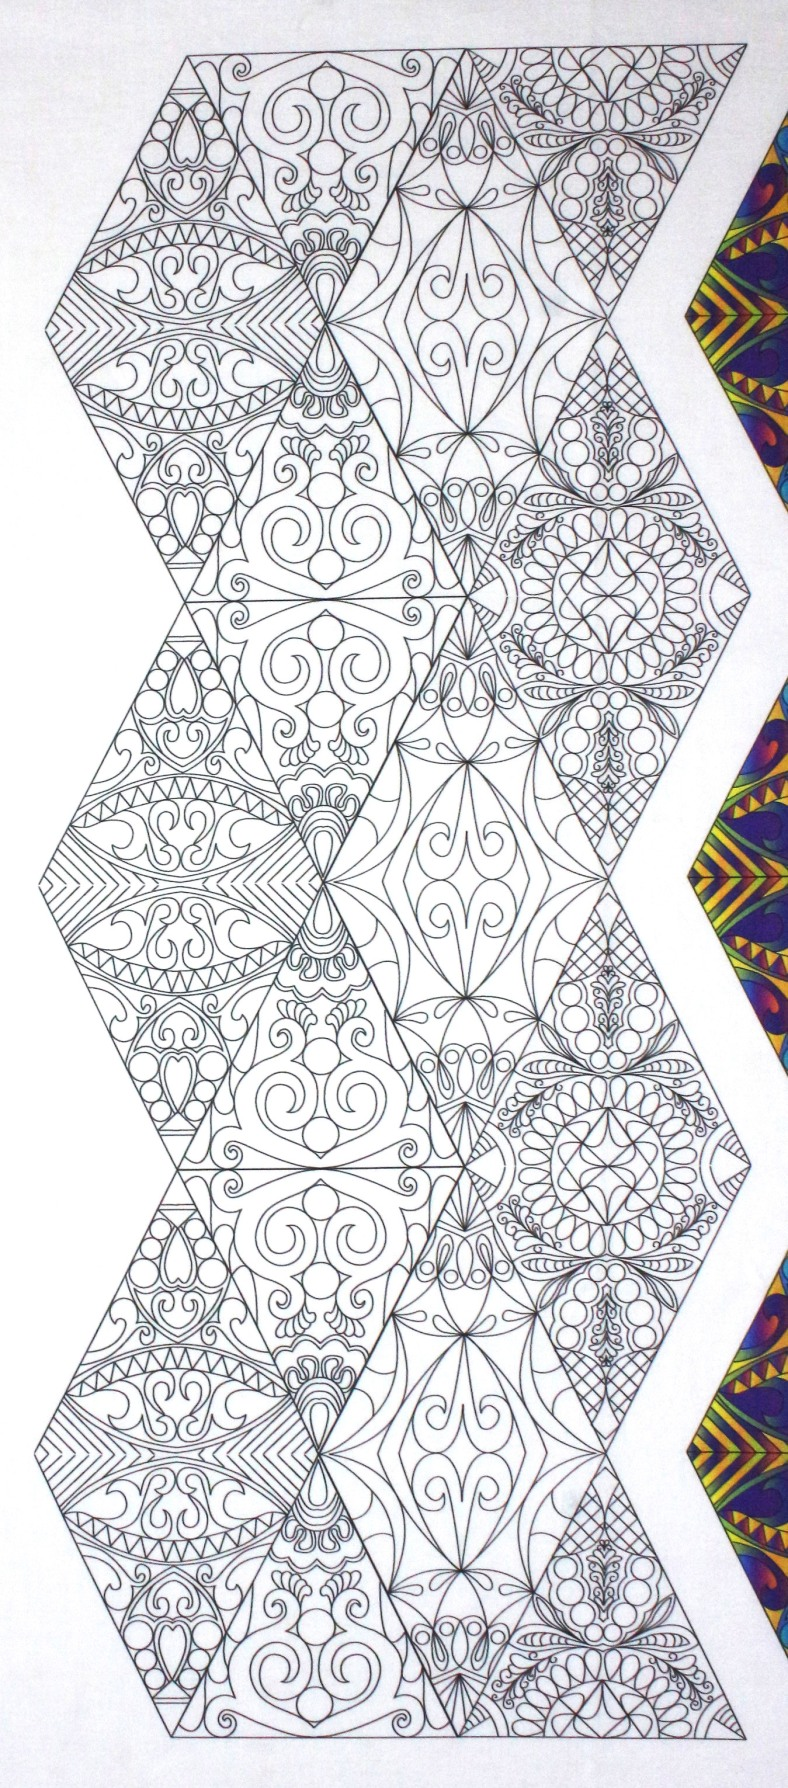 panel-c-black-white